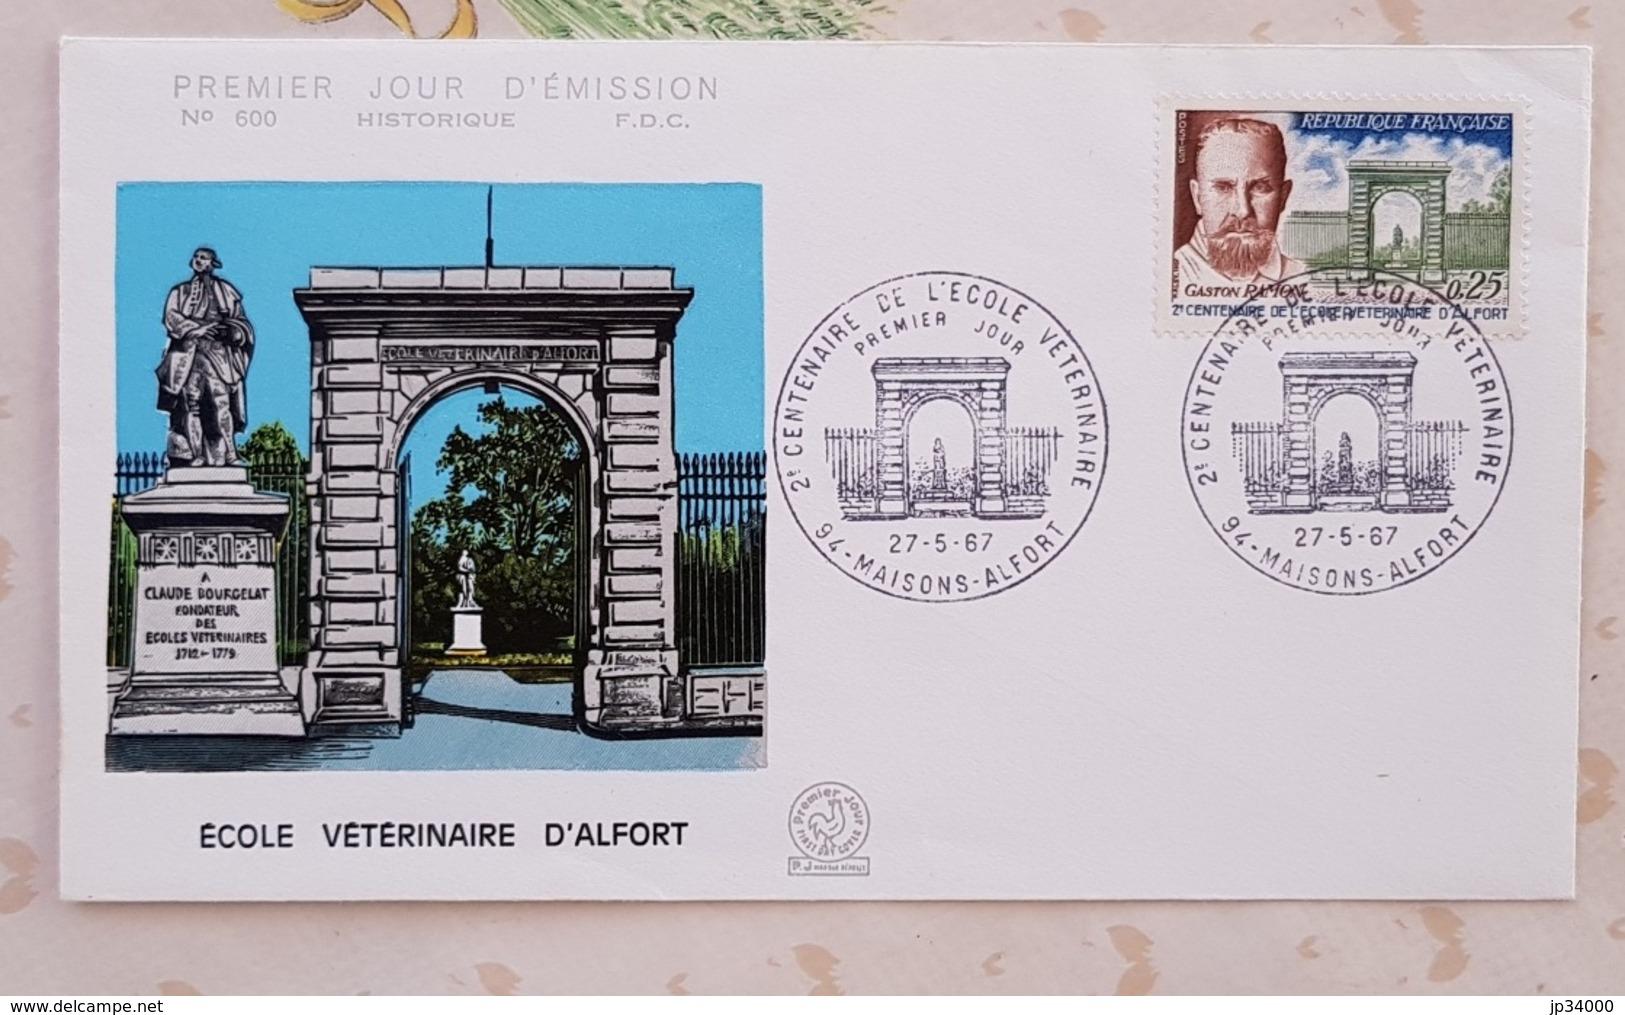 FRANCE Veterinaire, Veterinary, Veterinario, Tierärztlich, Ecole Veterinaire Maison Alfort FDC 1969 - Medizin